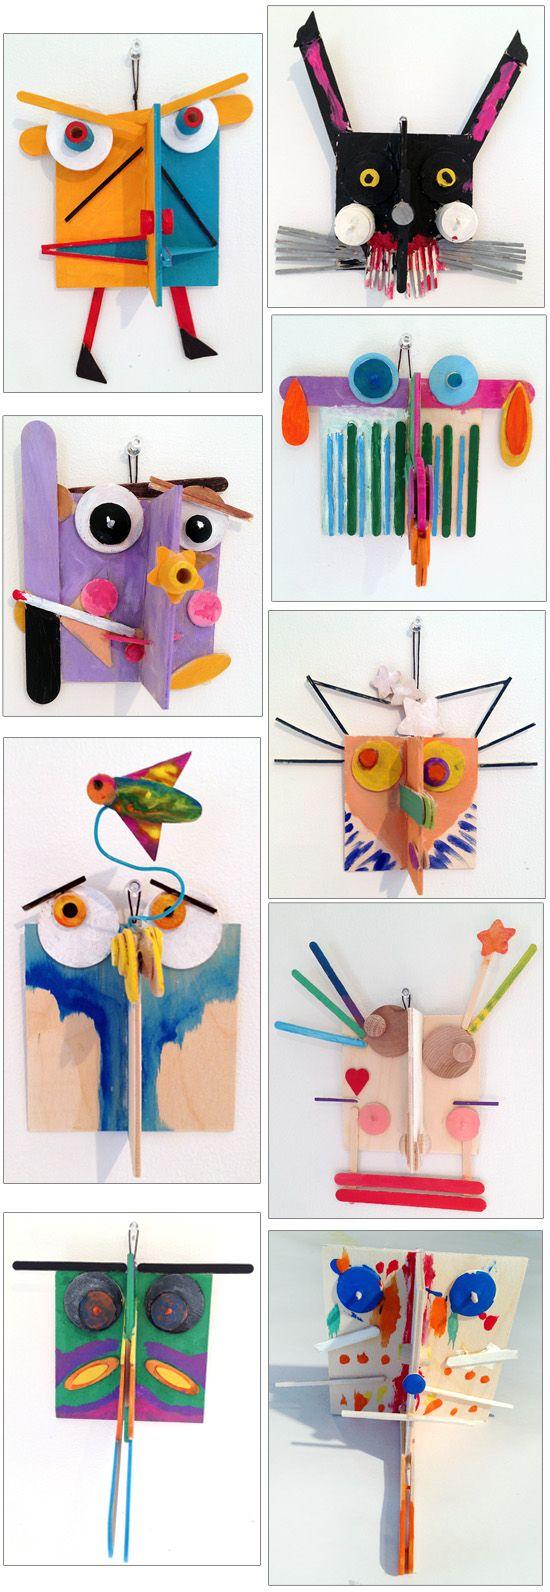 ArtLab Bronstein Sculptural Faces 2013